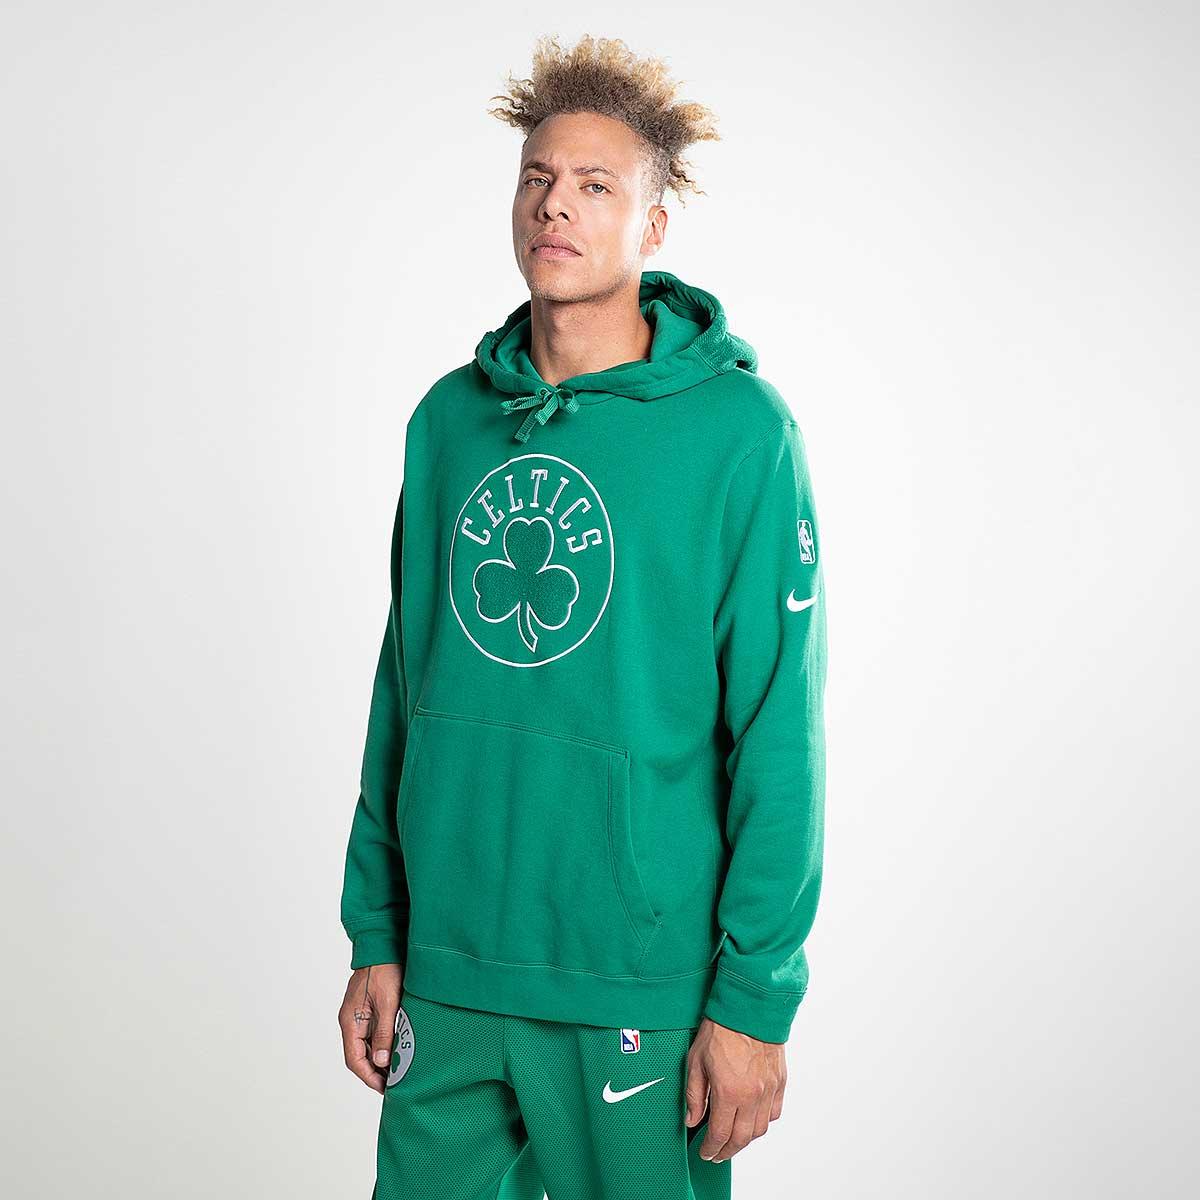 brand new 39e45 4c246 Nike NBA Boston Celtics Hoodie - NBA Shop Boston Celtics ...